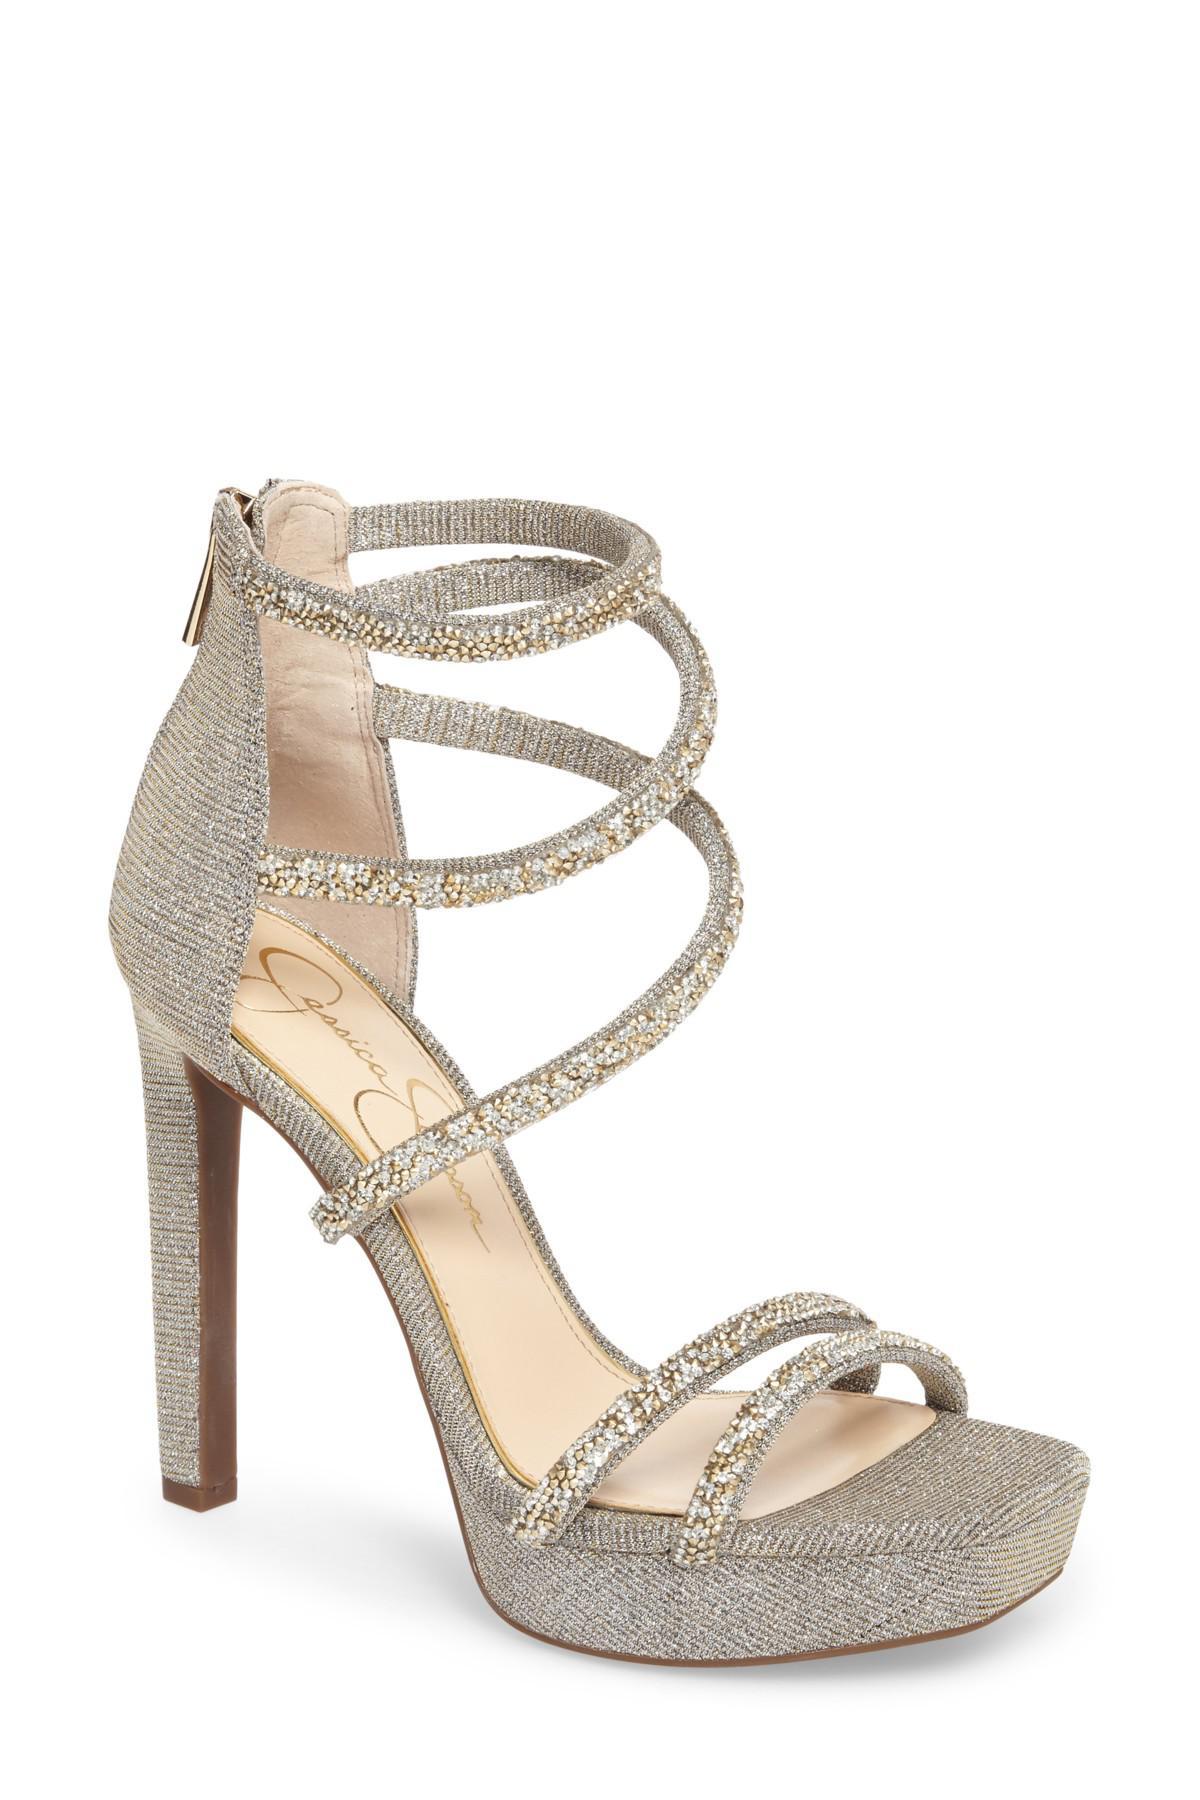 4ad9adb84175 Lyst - Jessica Simpson Jessica Beyonah Strappy Platform Sandal in ...